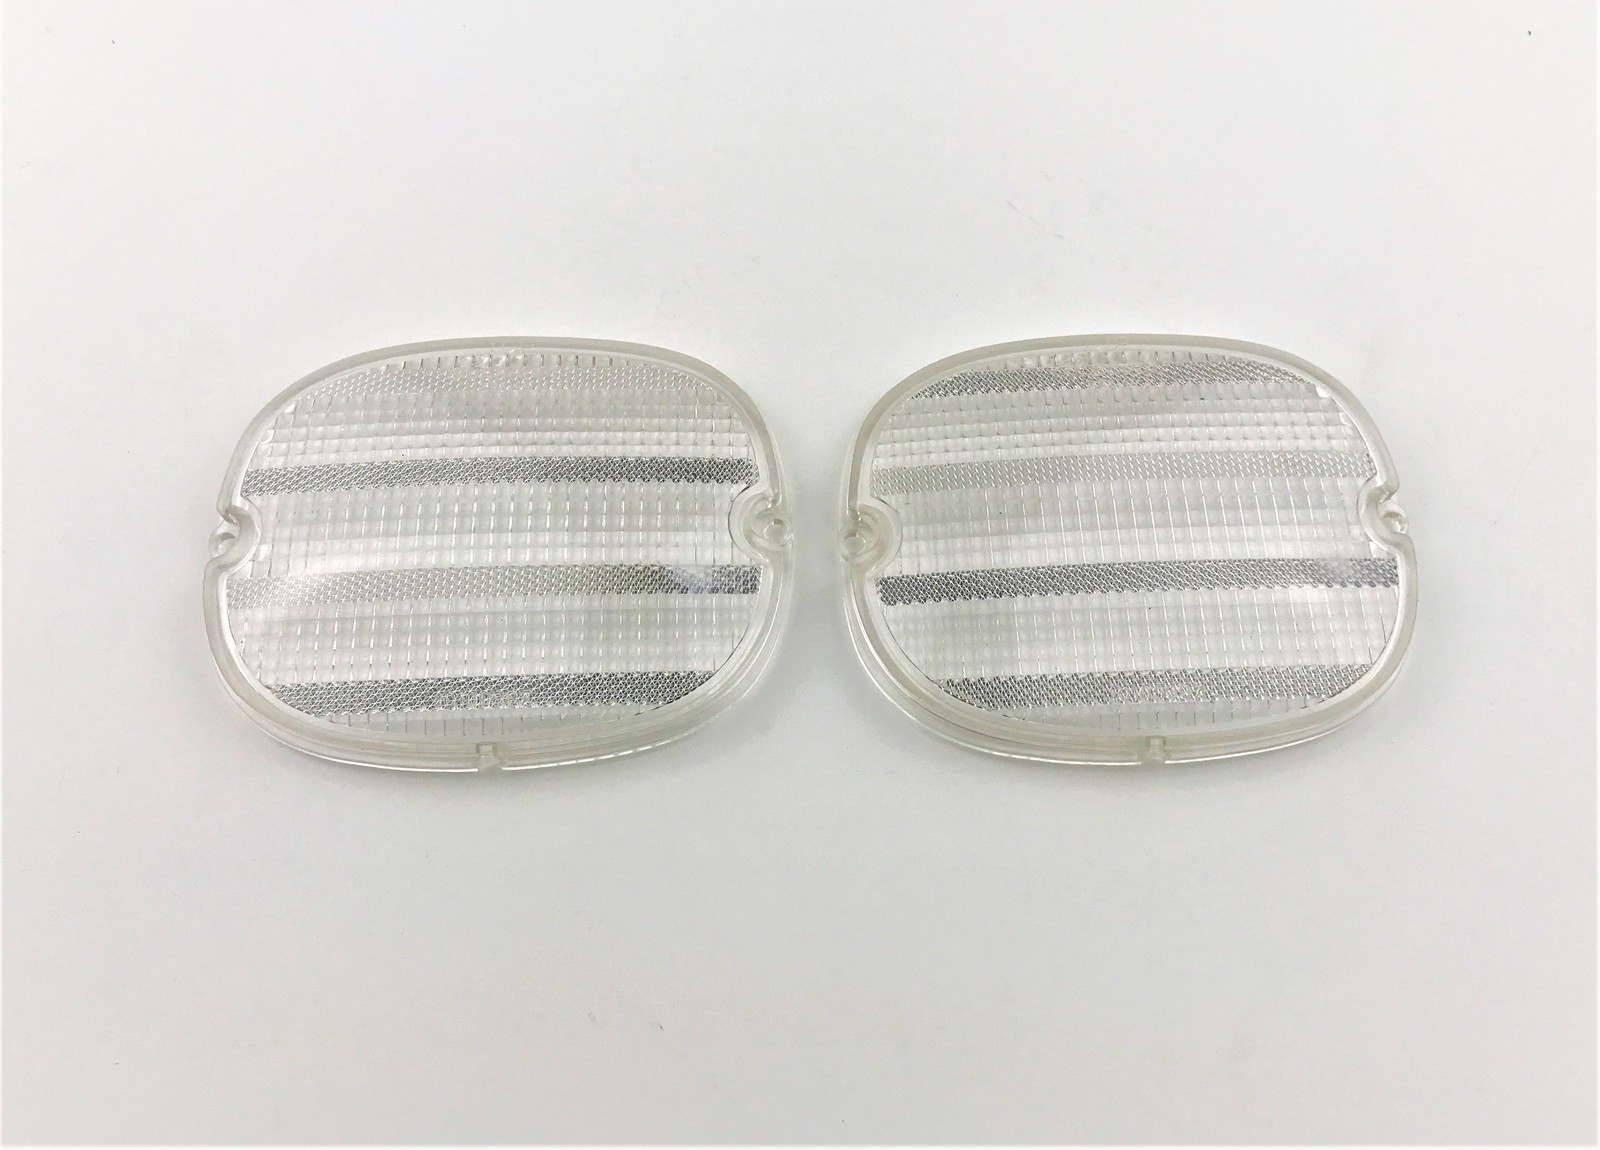 A-Team Performance 1991-1996 Chevy Corvette GM C4 Rear Tail Light Lens  Clear 91